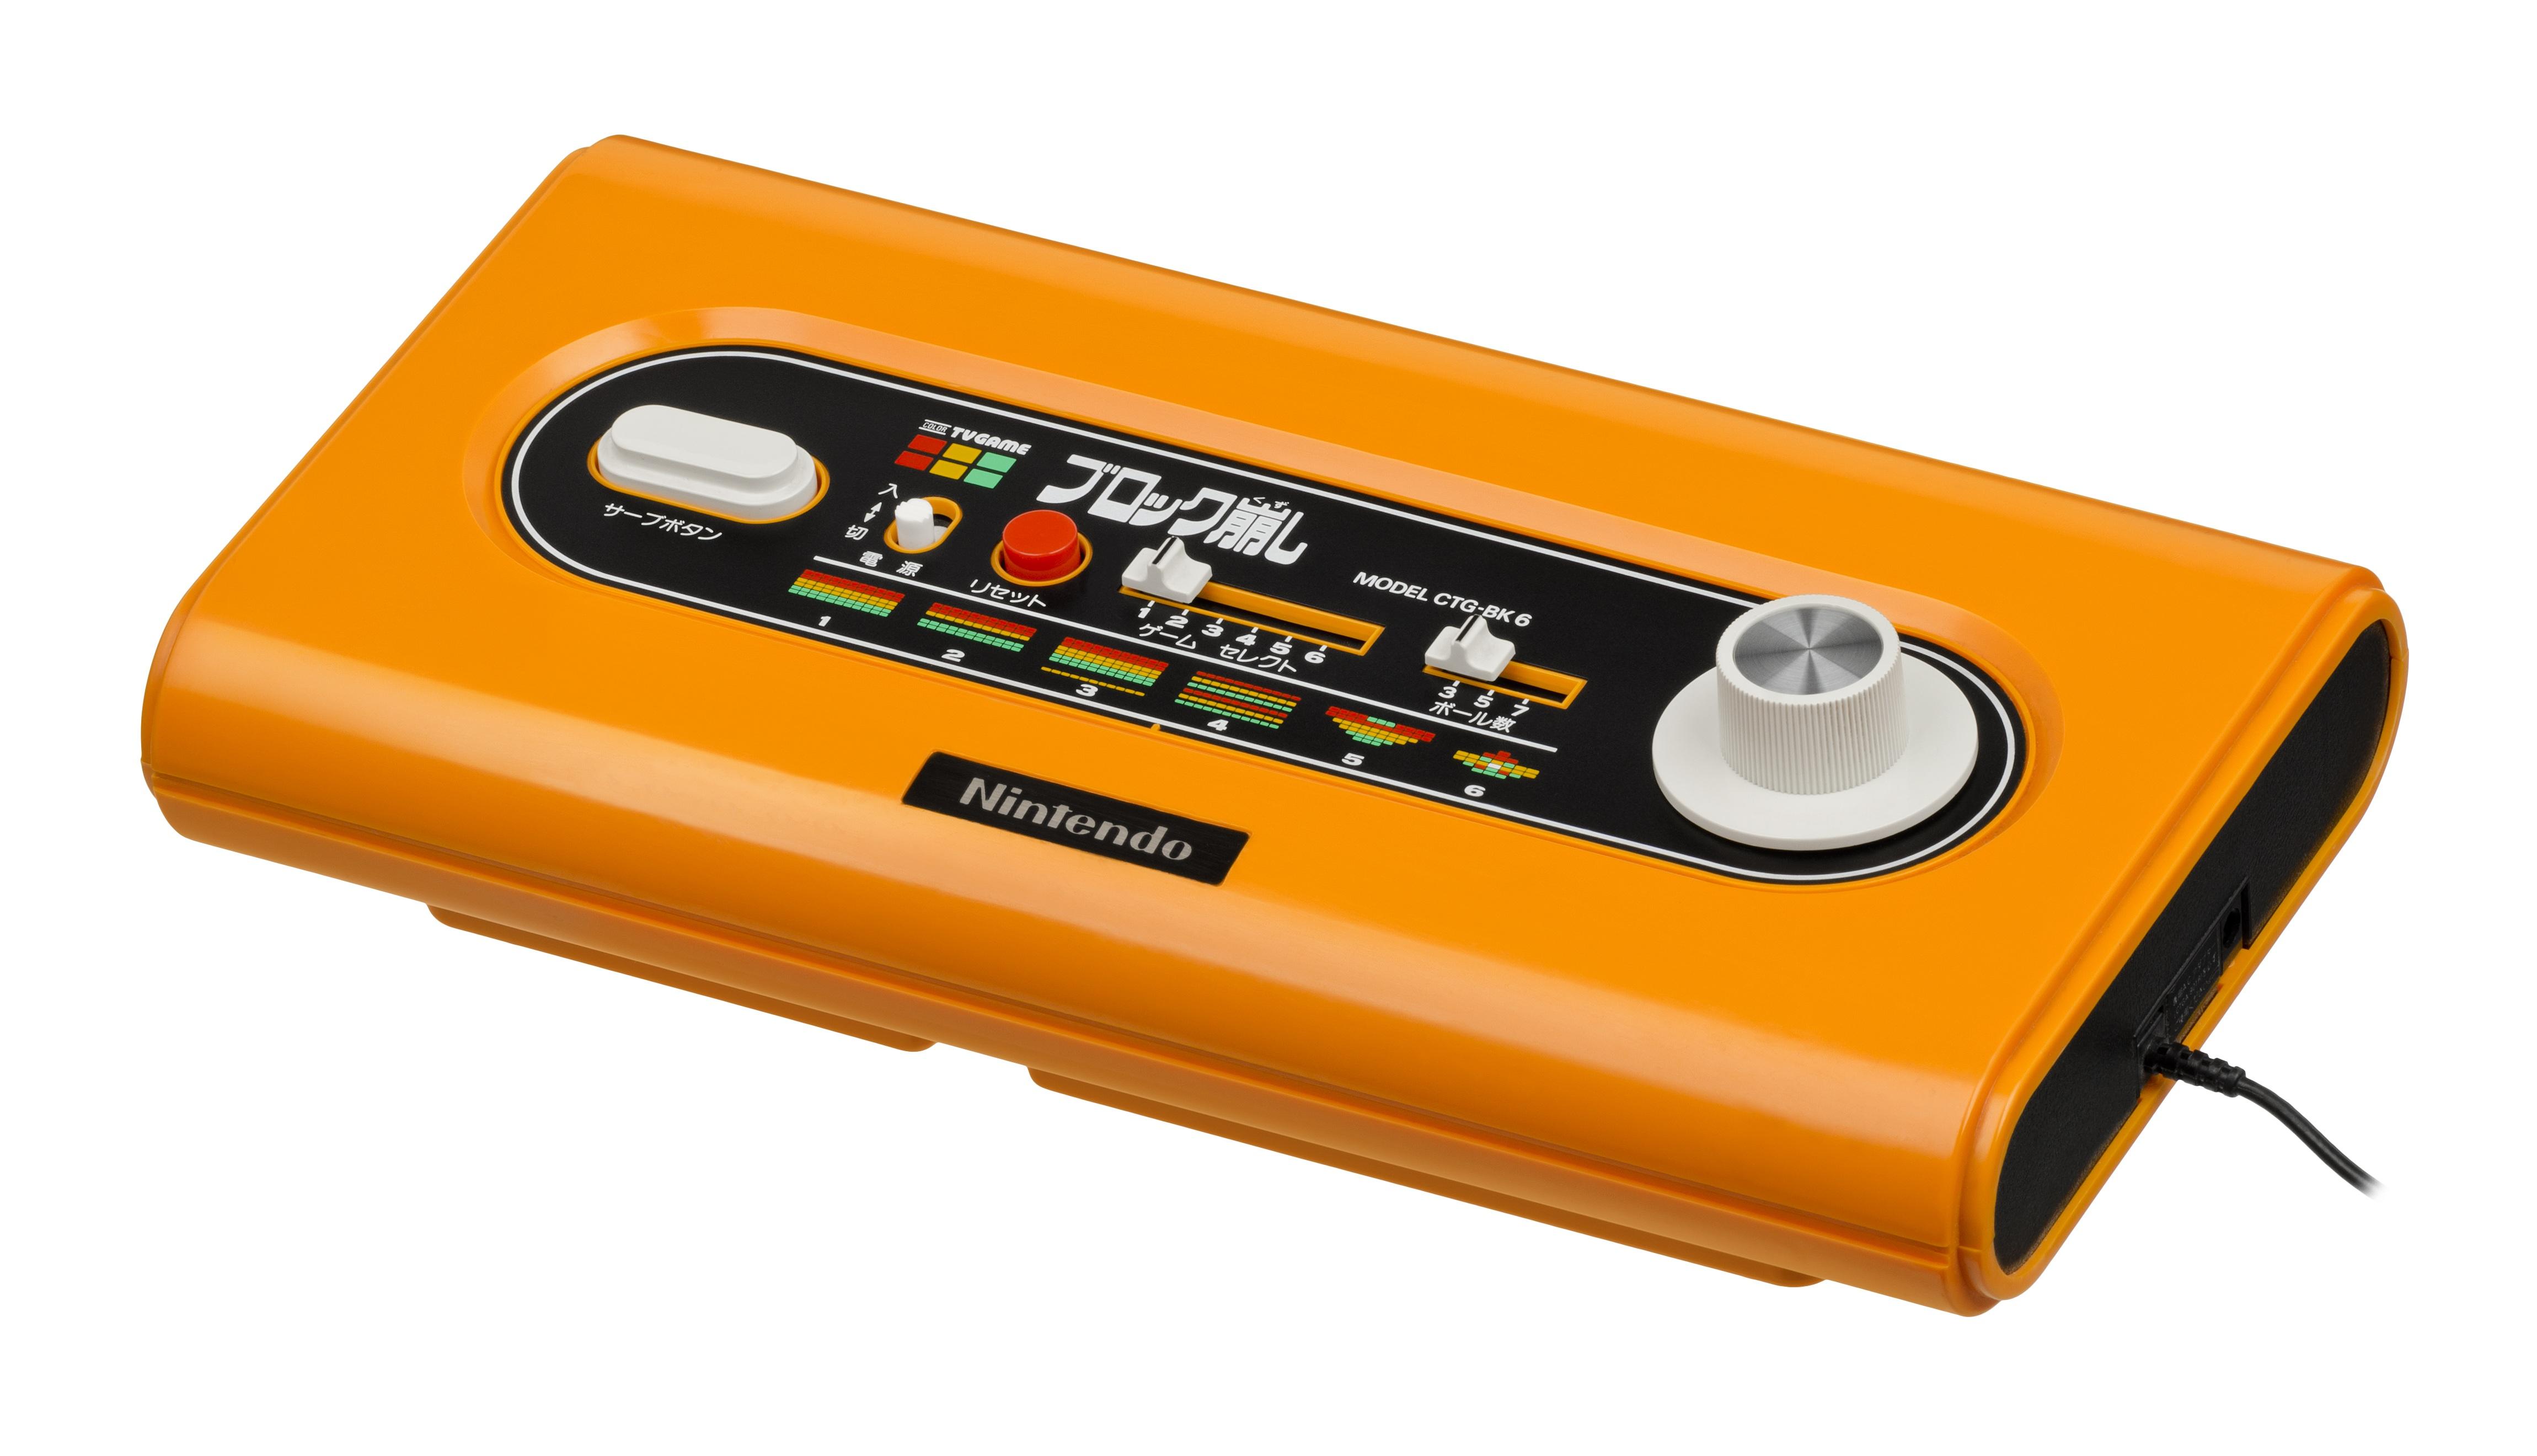 Orange and Black Nintendo Game Console